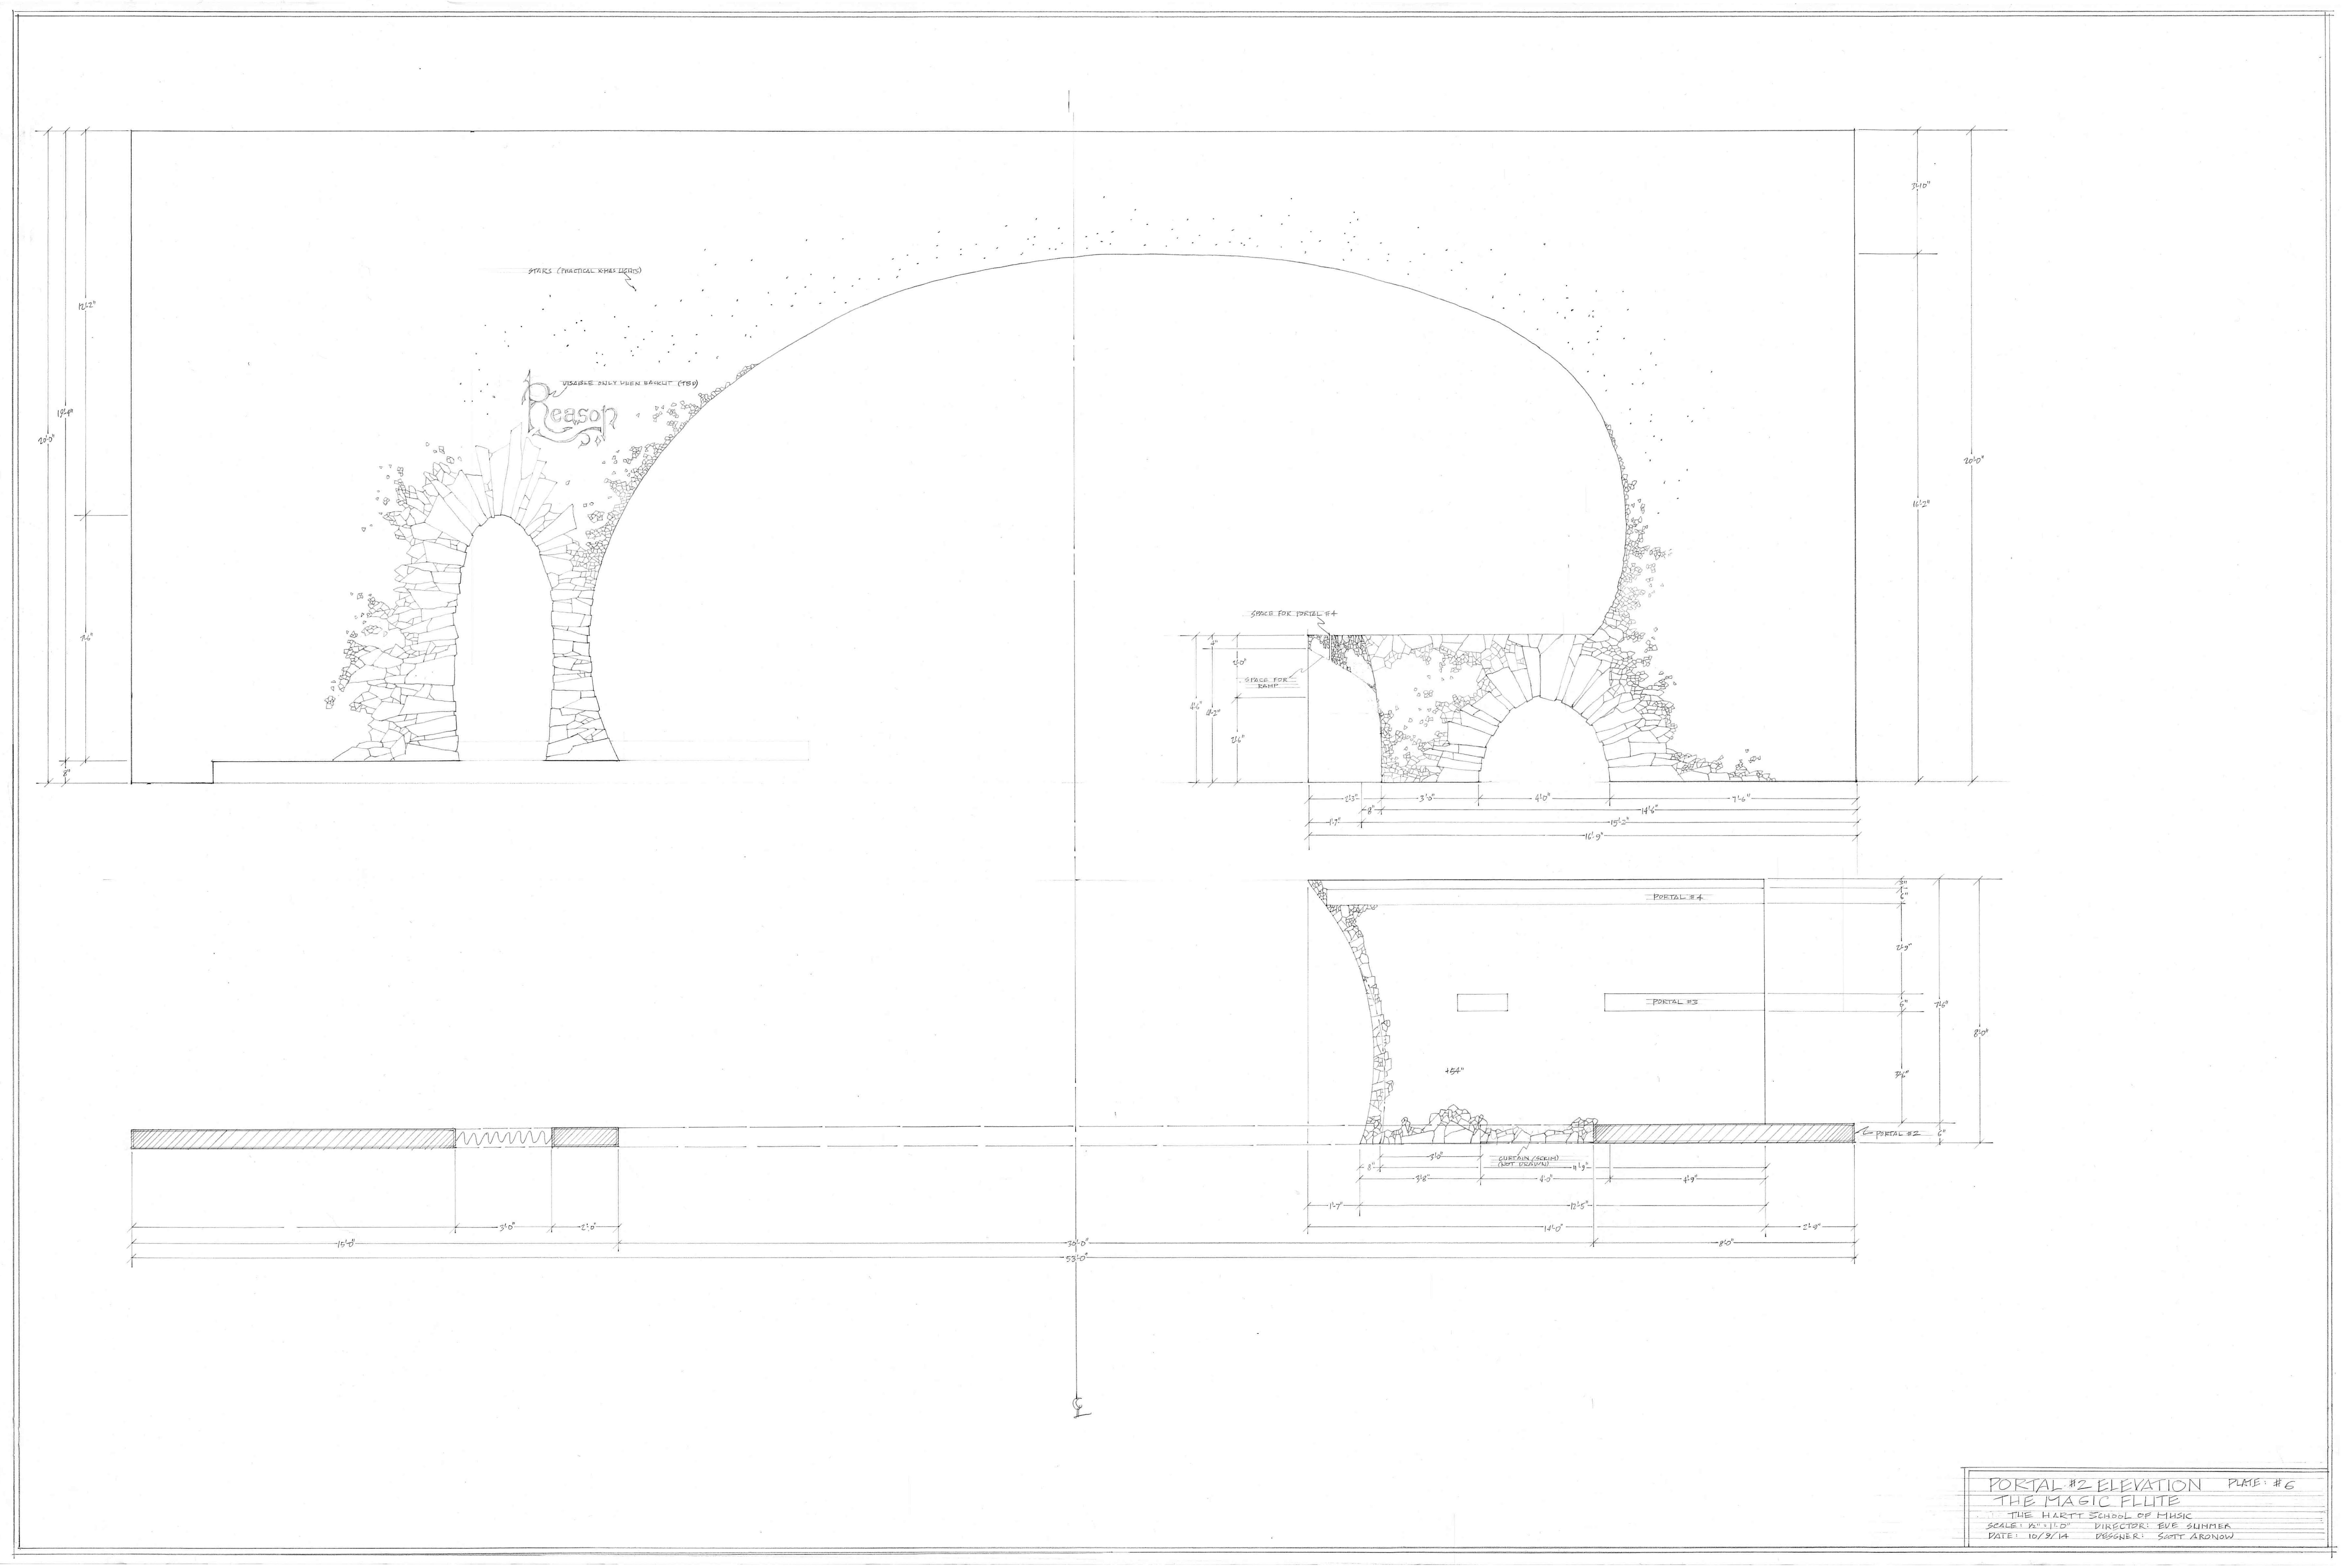 Plate #6. Portal #2 Elevation